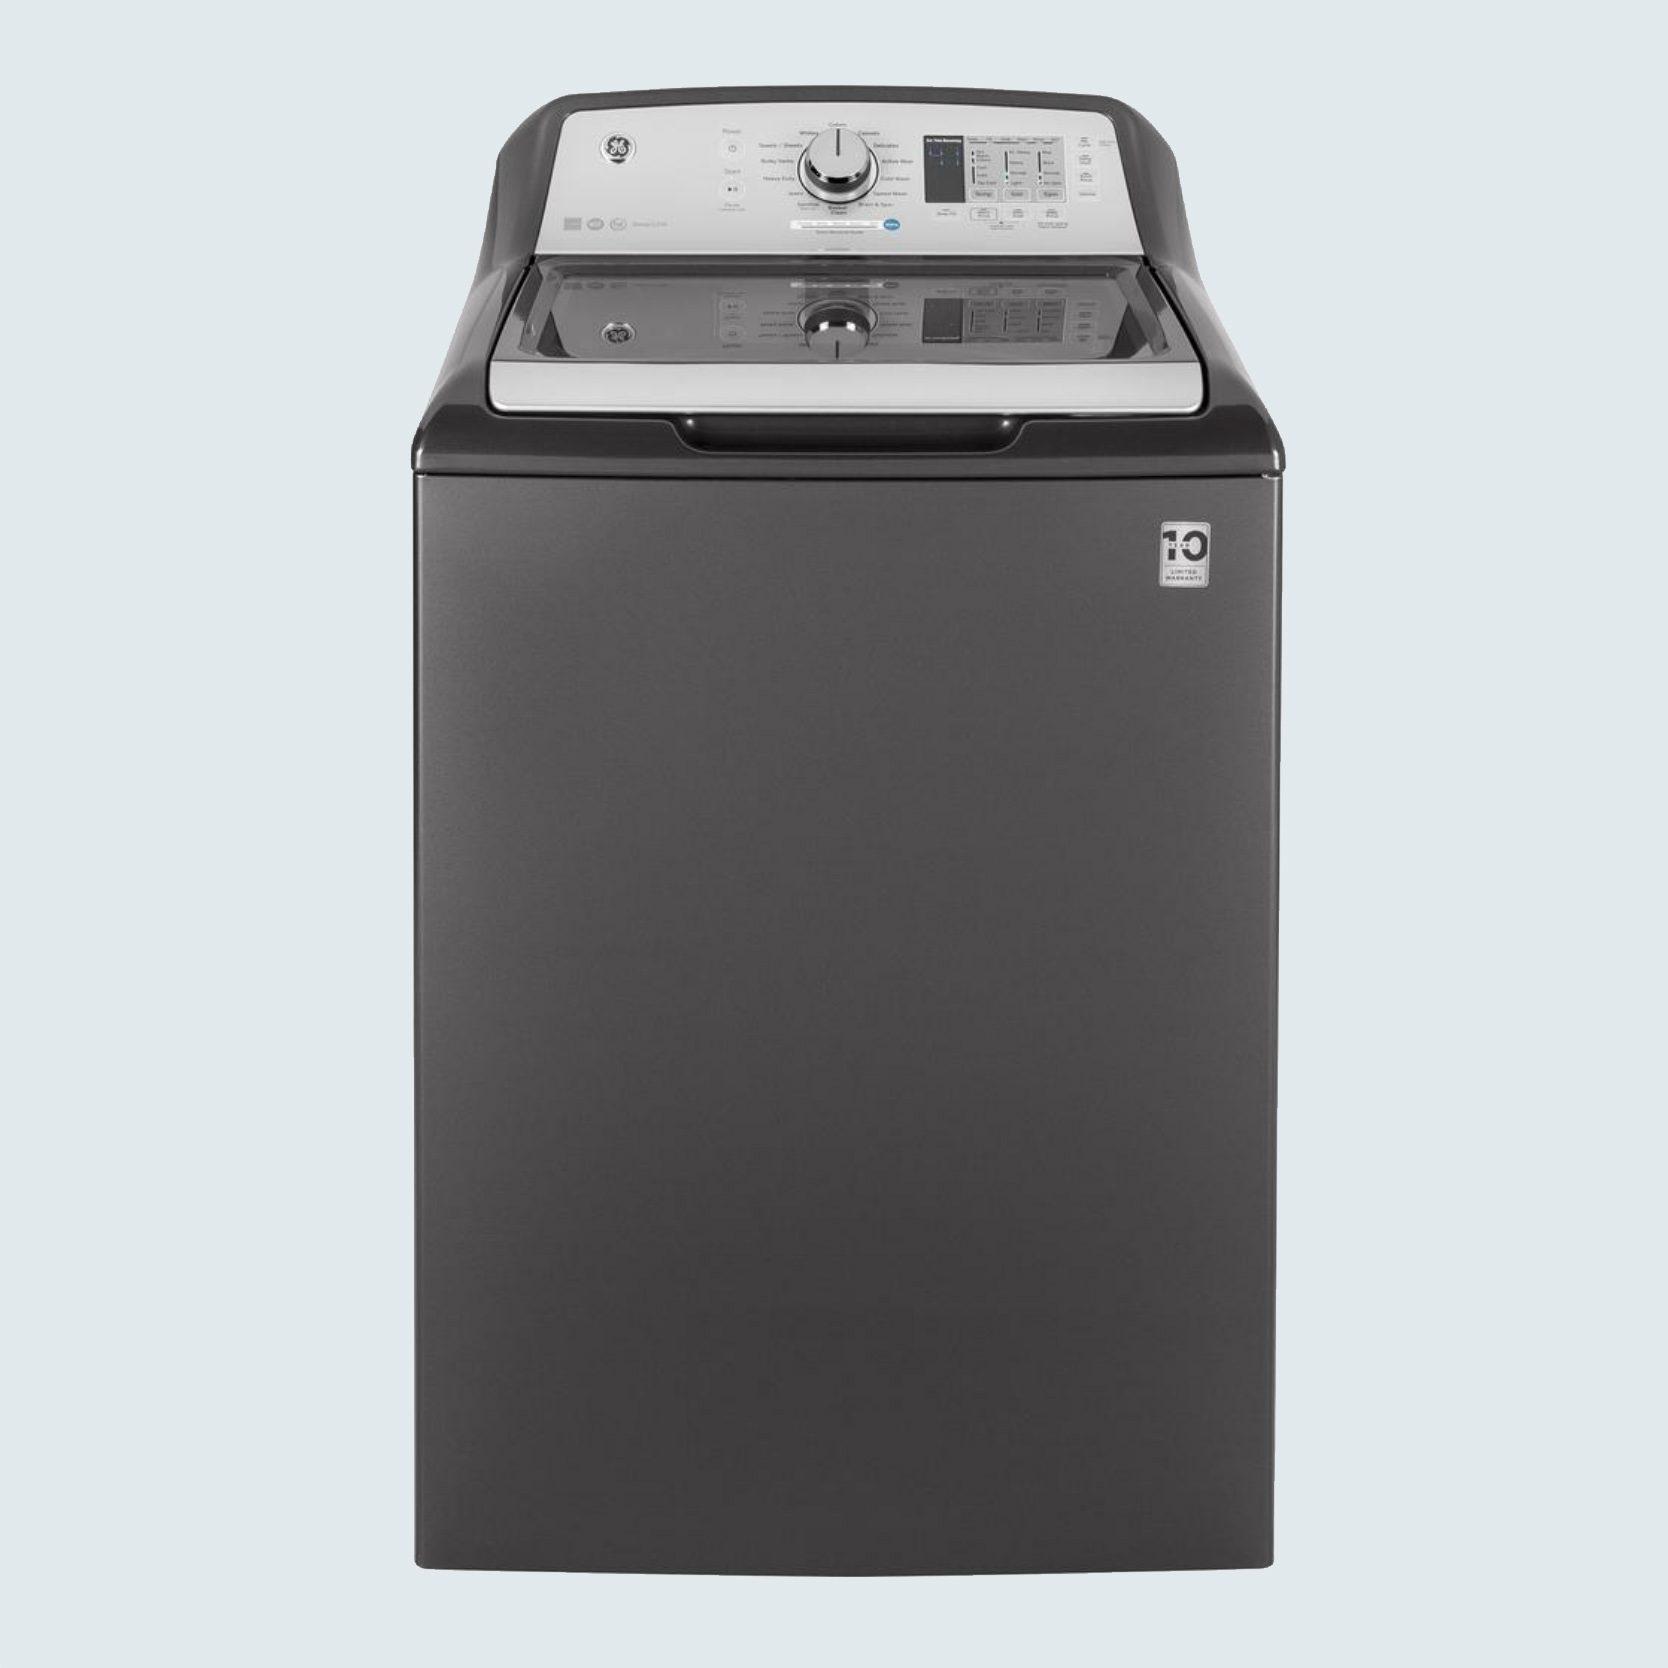 GE High-Efficiency Washing Machine